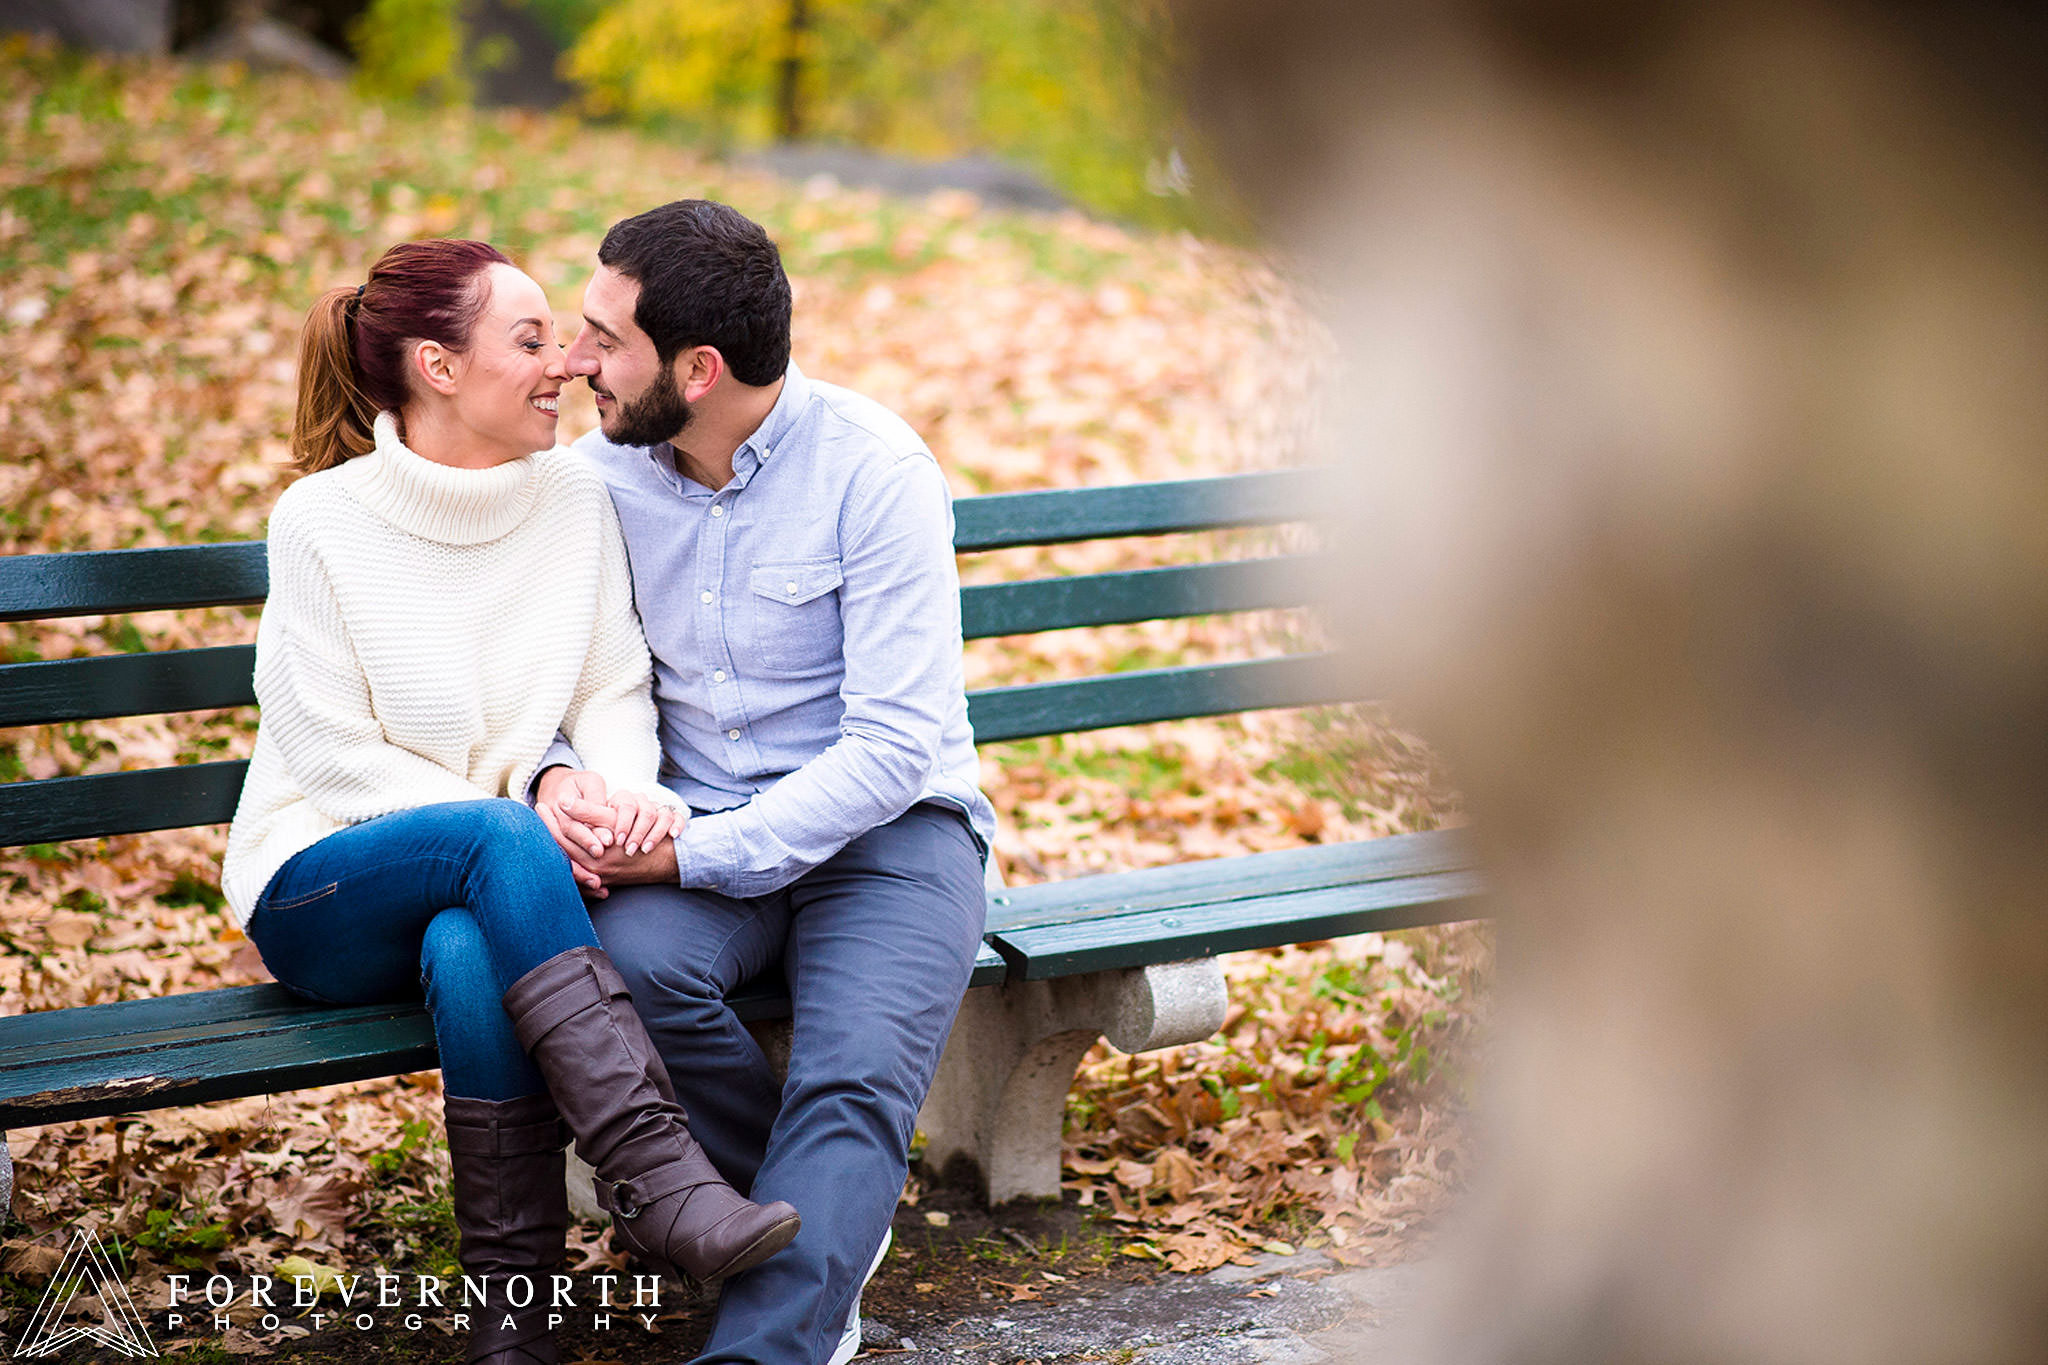 Giangrande-Central-Park-New-York-Engagement-Photos-16.JPG